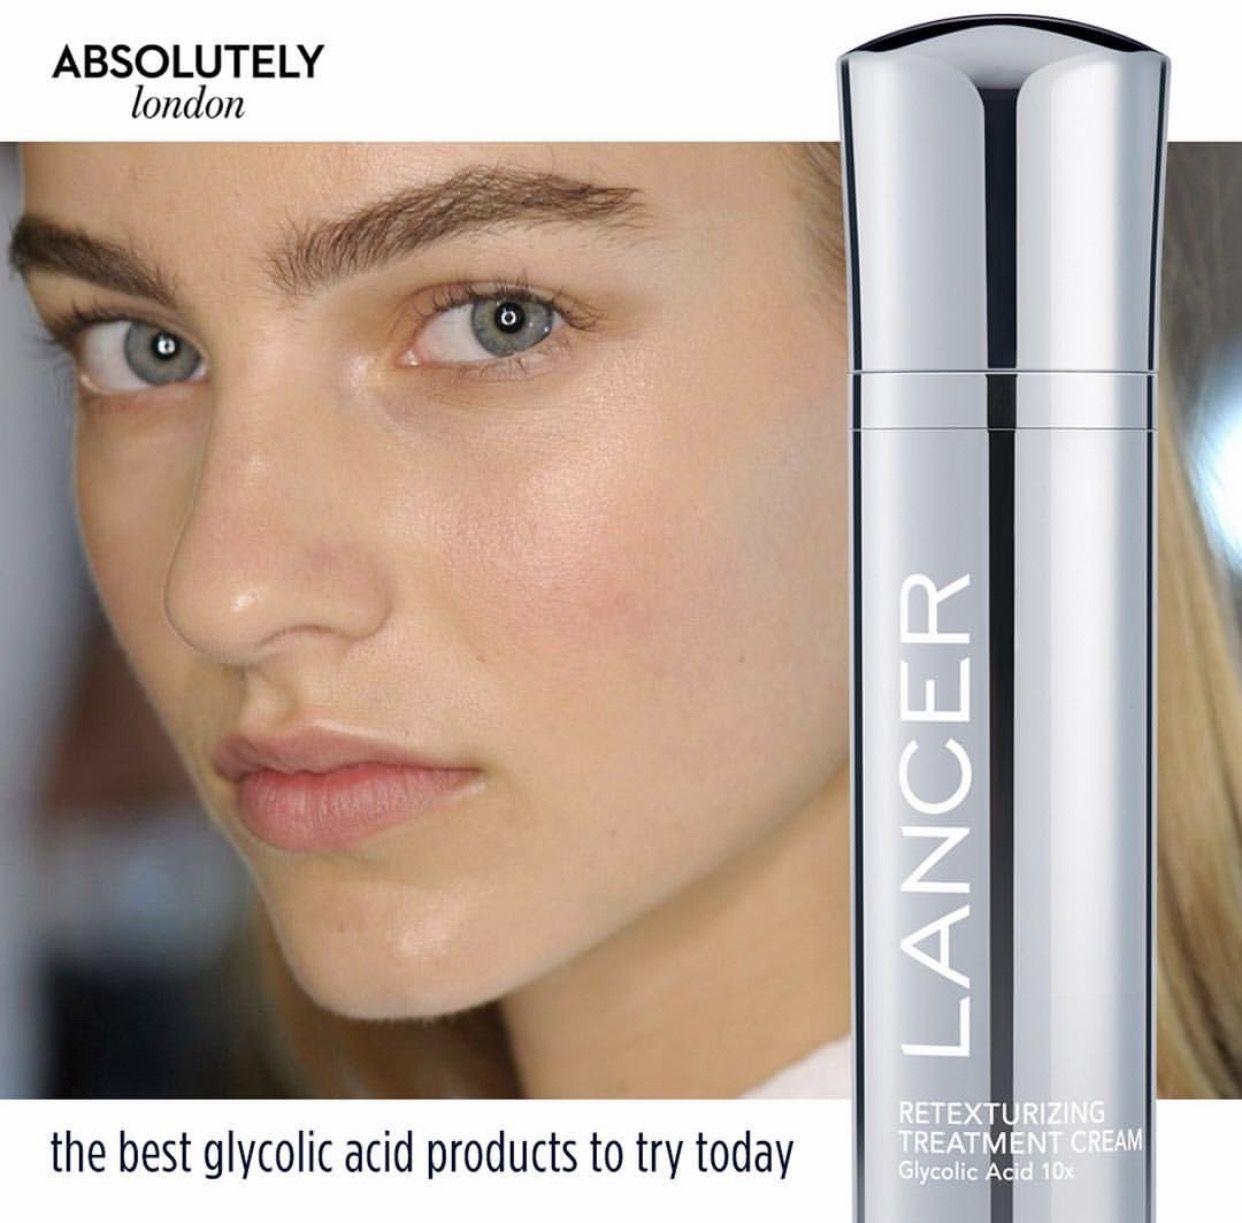 62697280d8b Dry Skin, Everything, Cleanser, Moisturizer, Skincare, Wwe, Nail Polish,